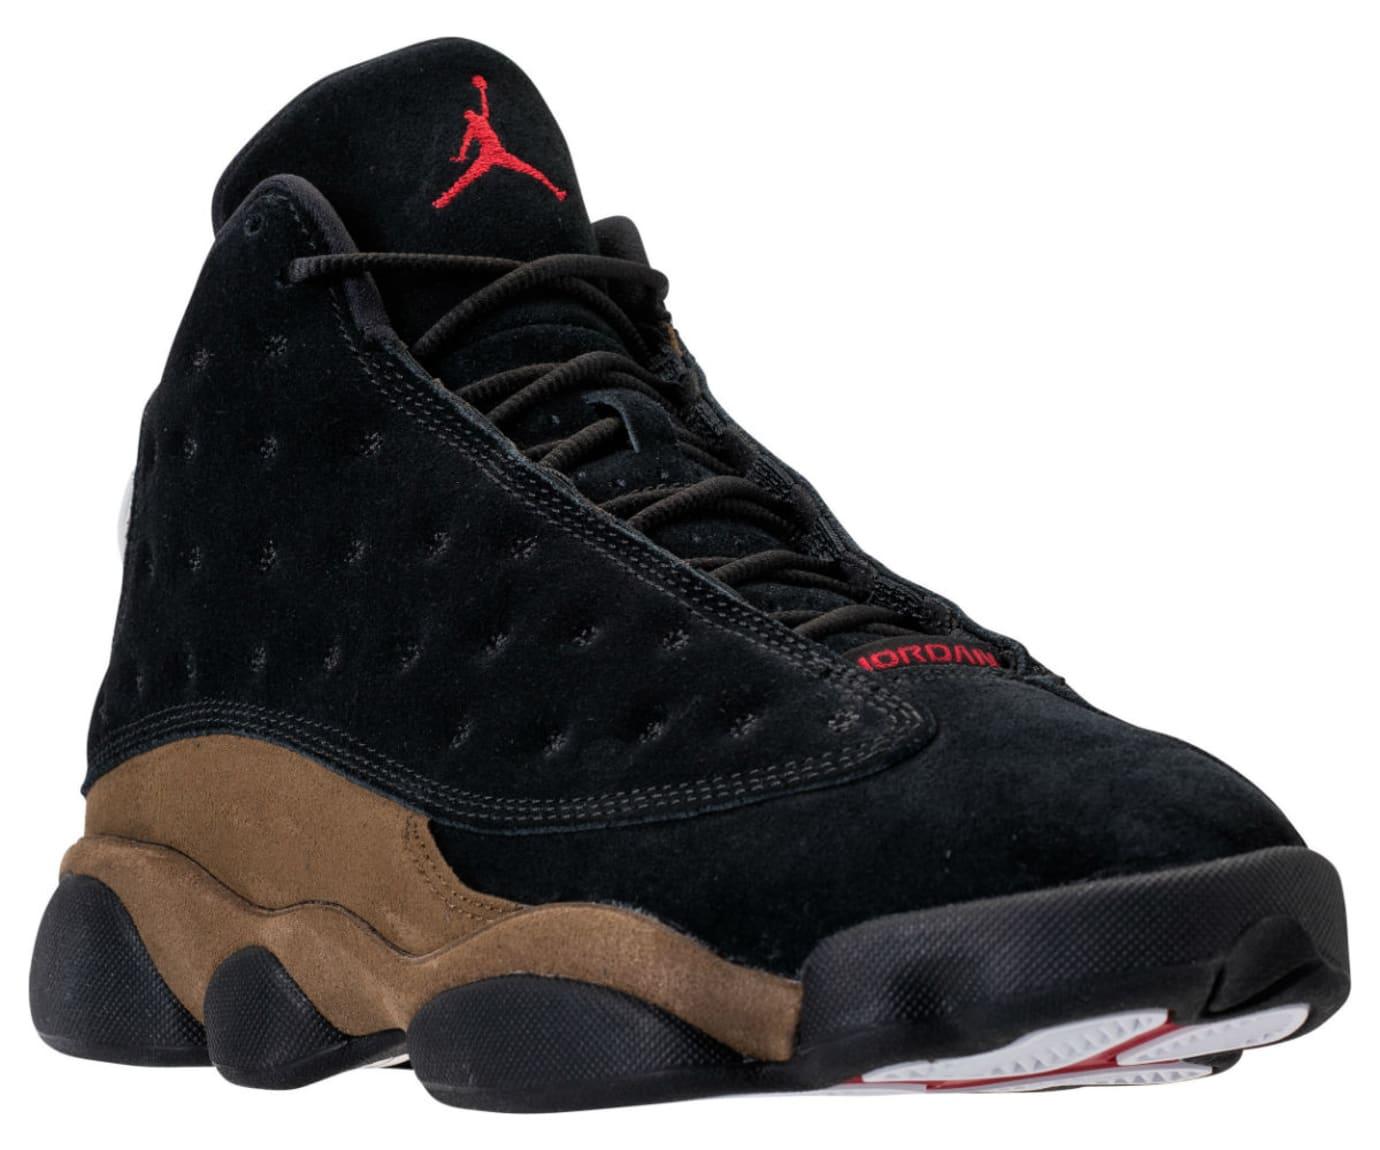 bd58982da70c1c Air Jordan 13  Olive  Black True Red-Light Olive 414571-006